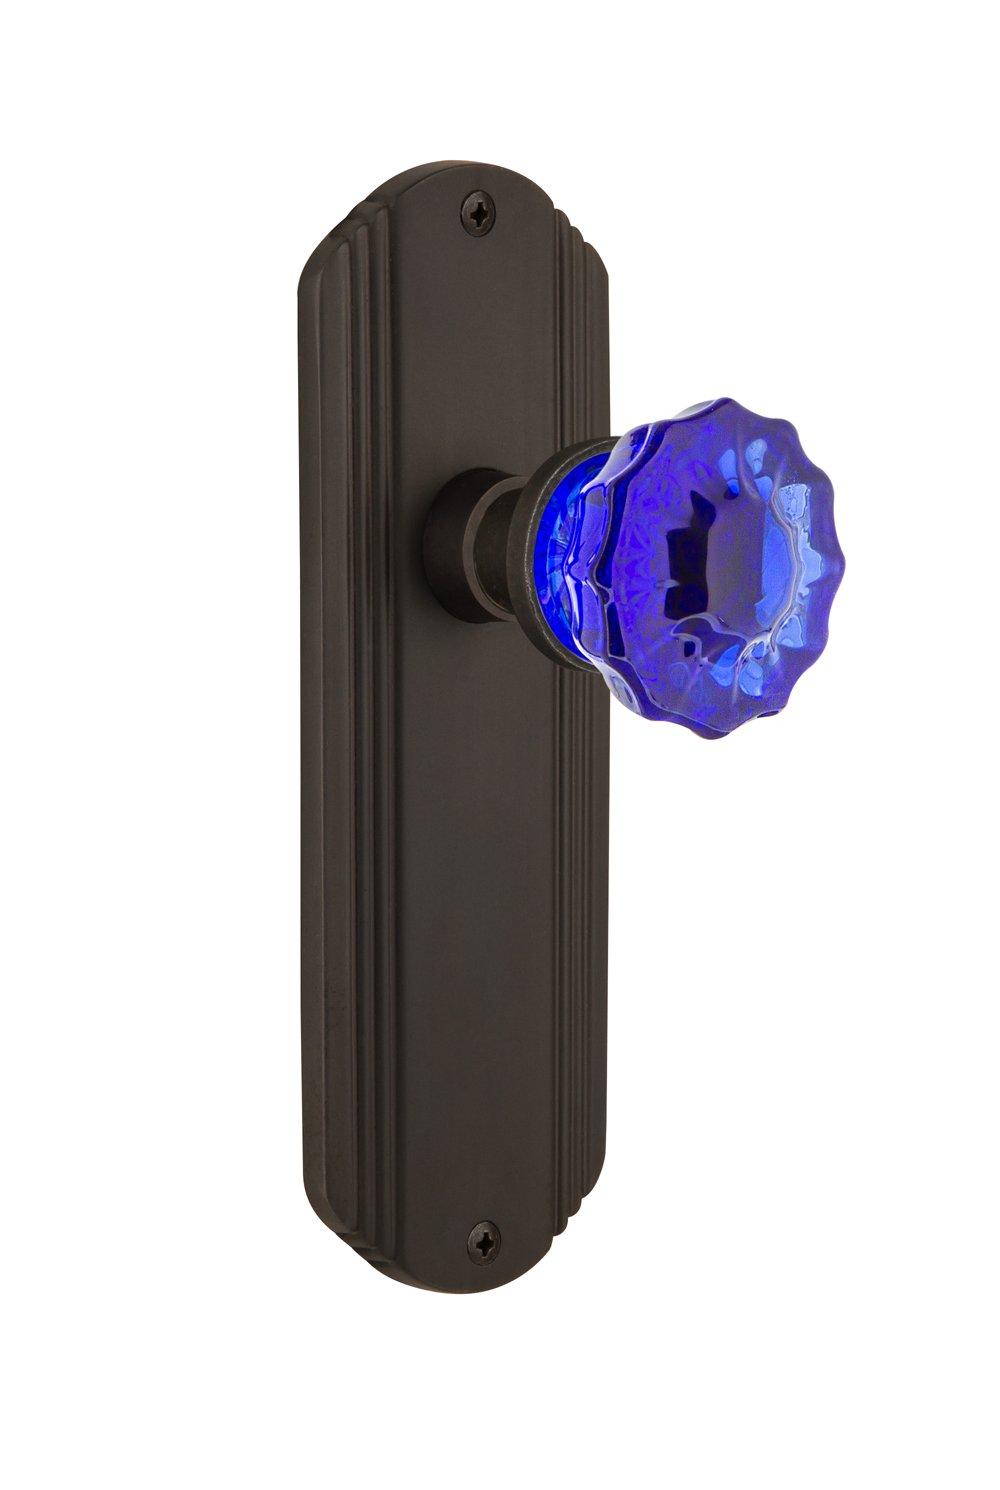 Nostalgic Warehouse 720465 Deco Plate Passage Crystal Cobalt Glass Door Knob in Unlaquered Brass 2.75